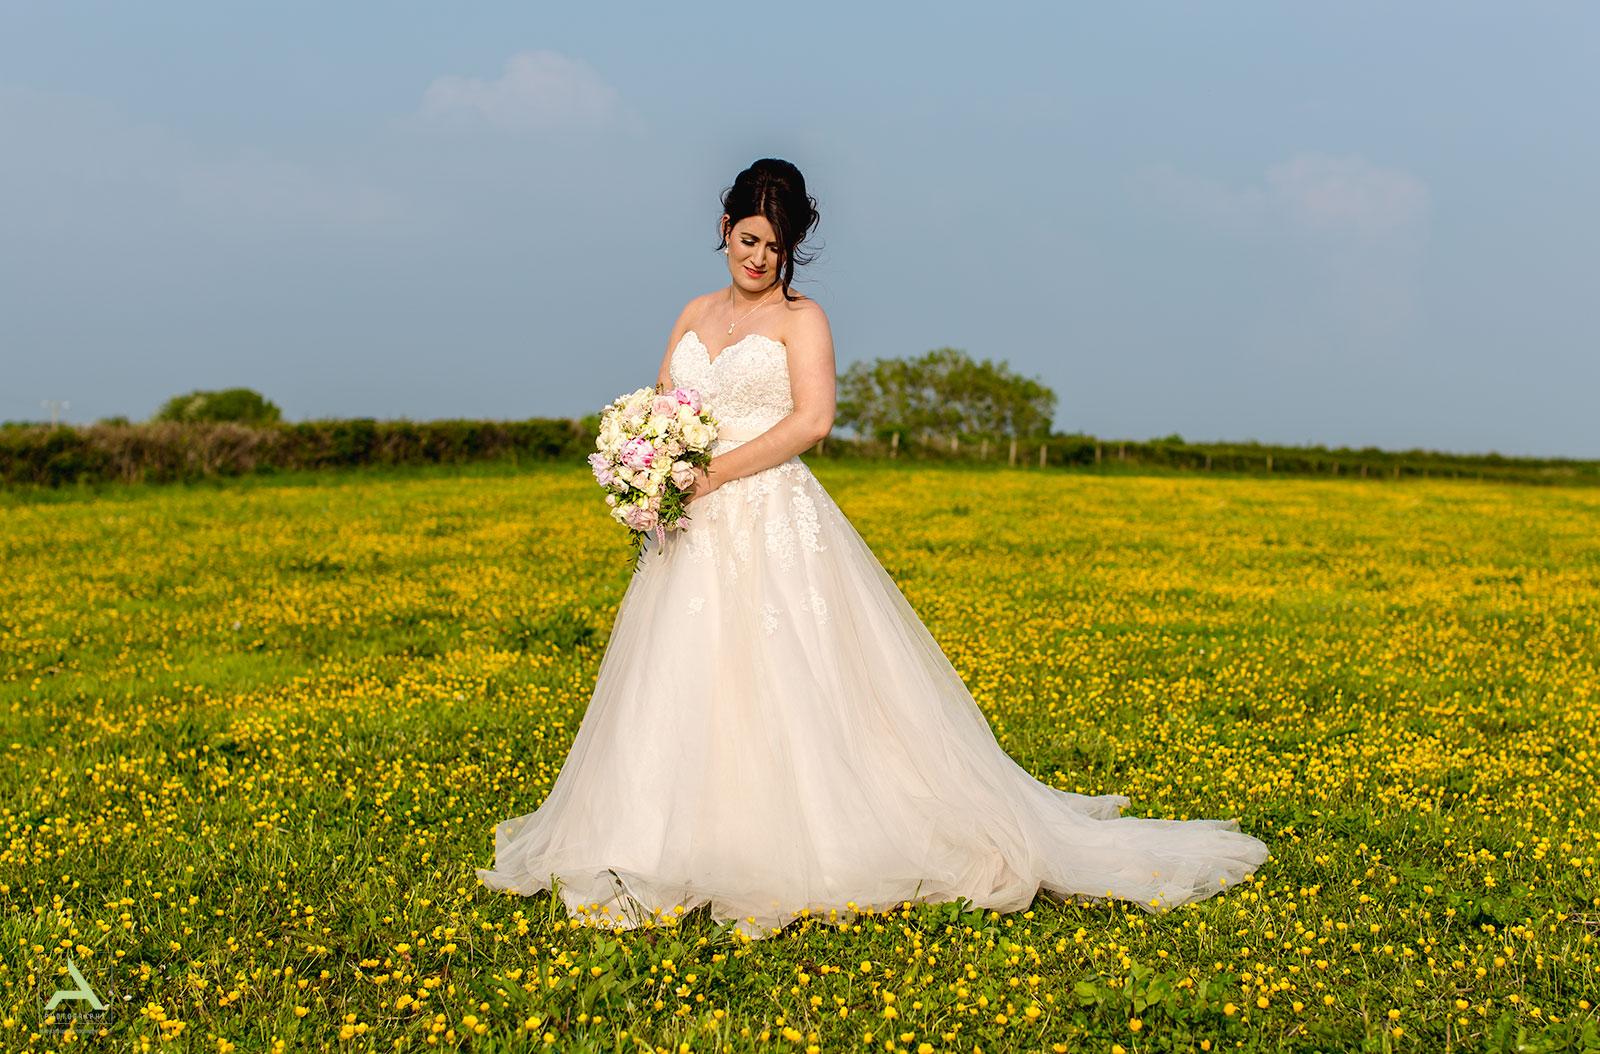 Gower Wedding Photographer Swansea